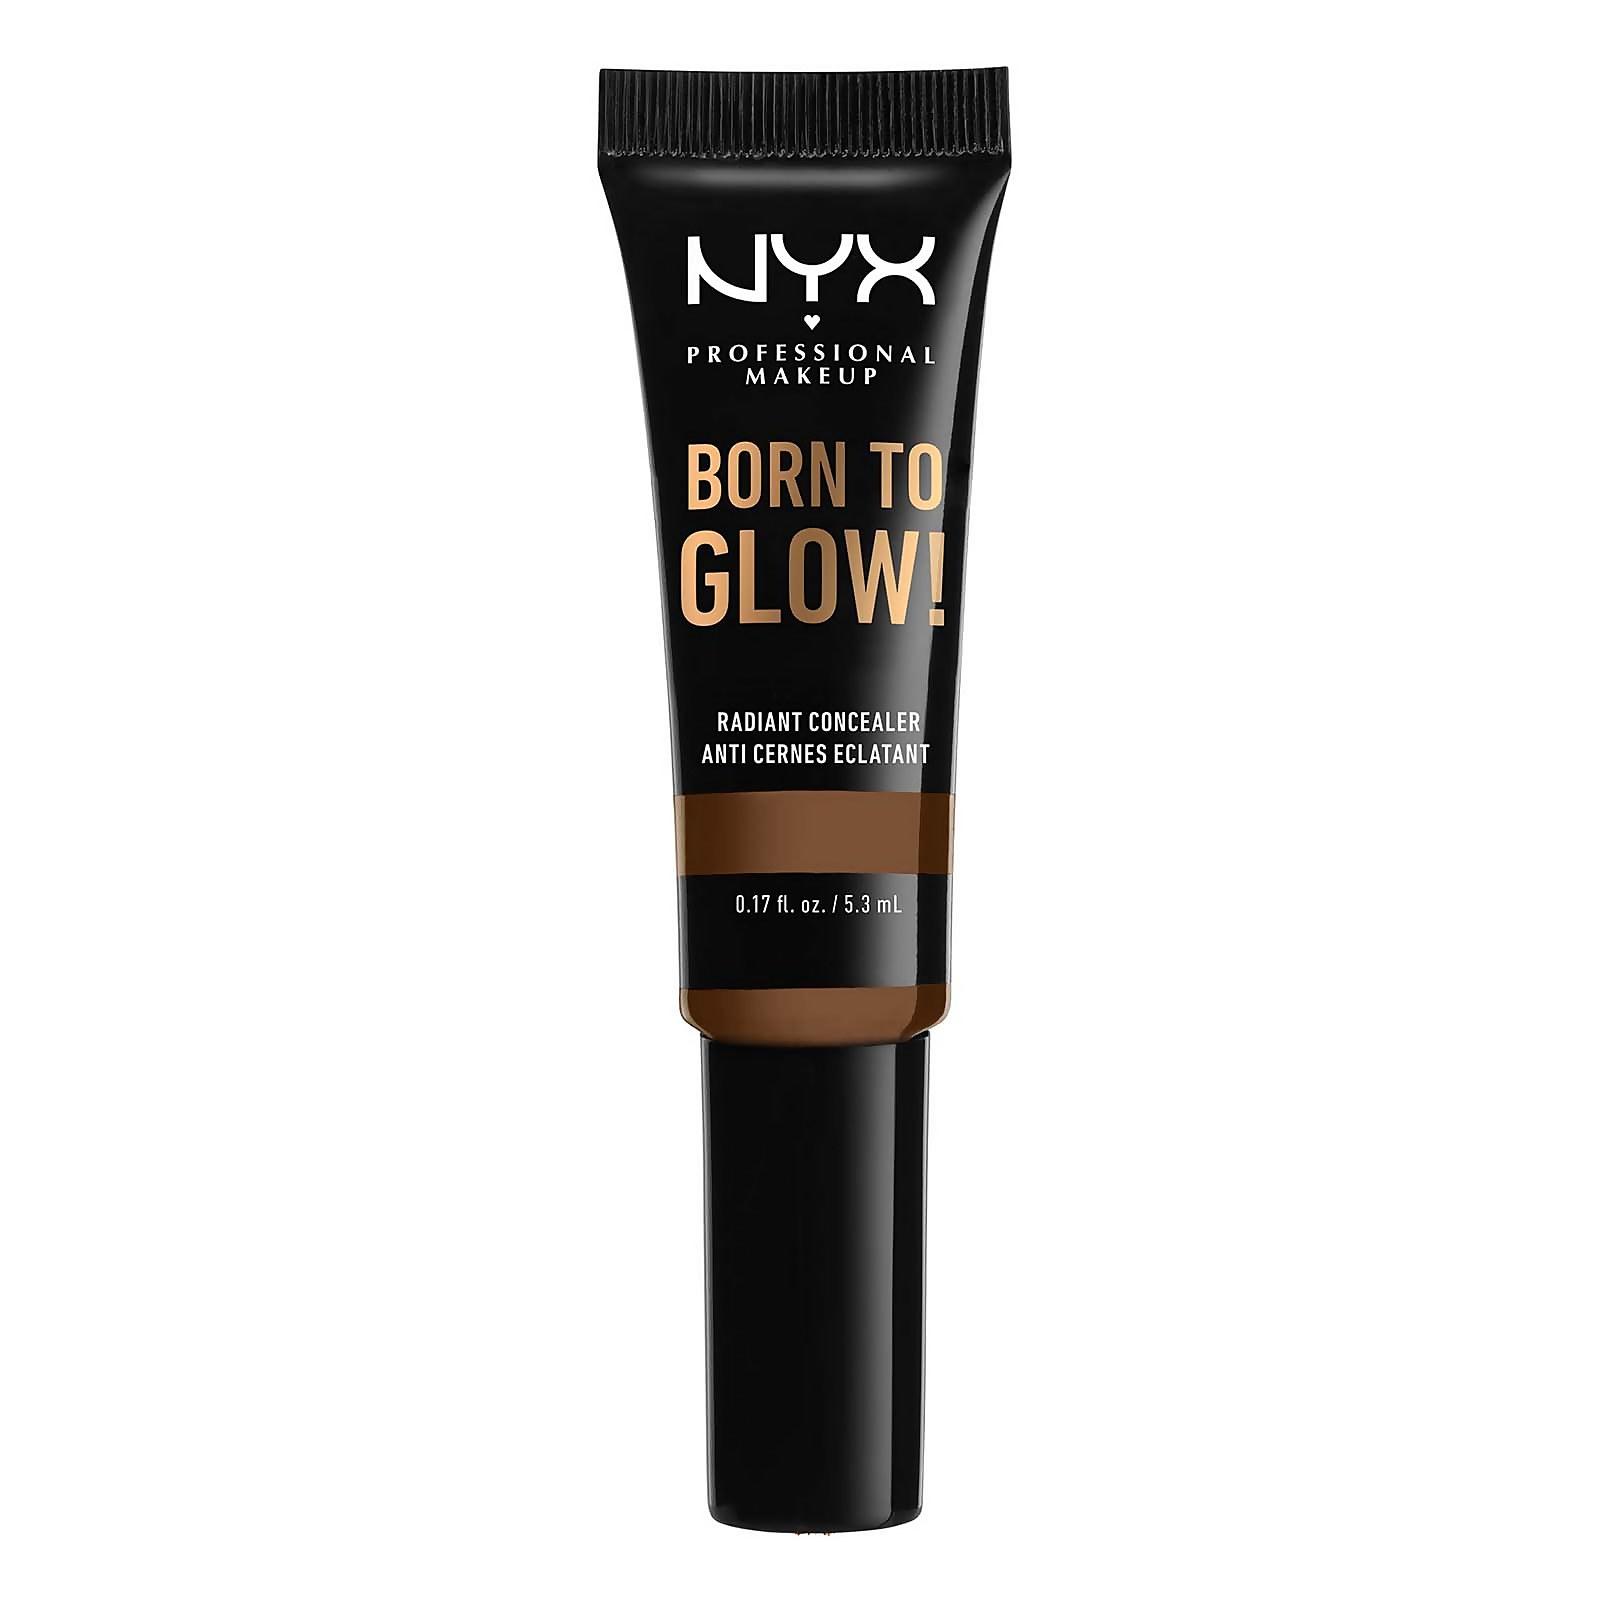 NYX Professional Makeup Born to Glow Radiant Concealer (Various Shades) - Mocha  - Купить